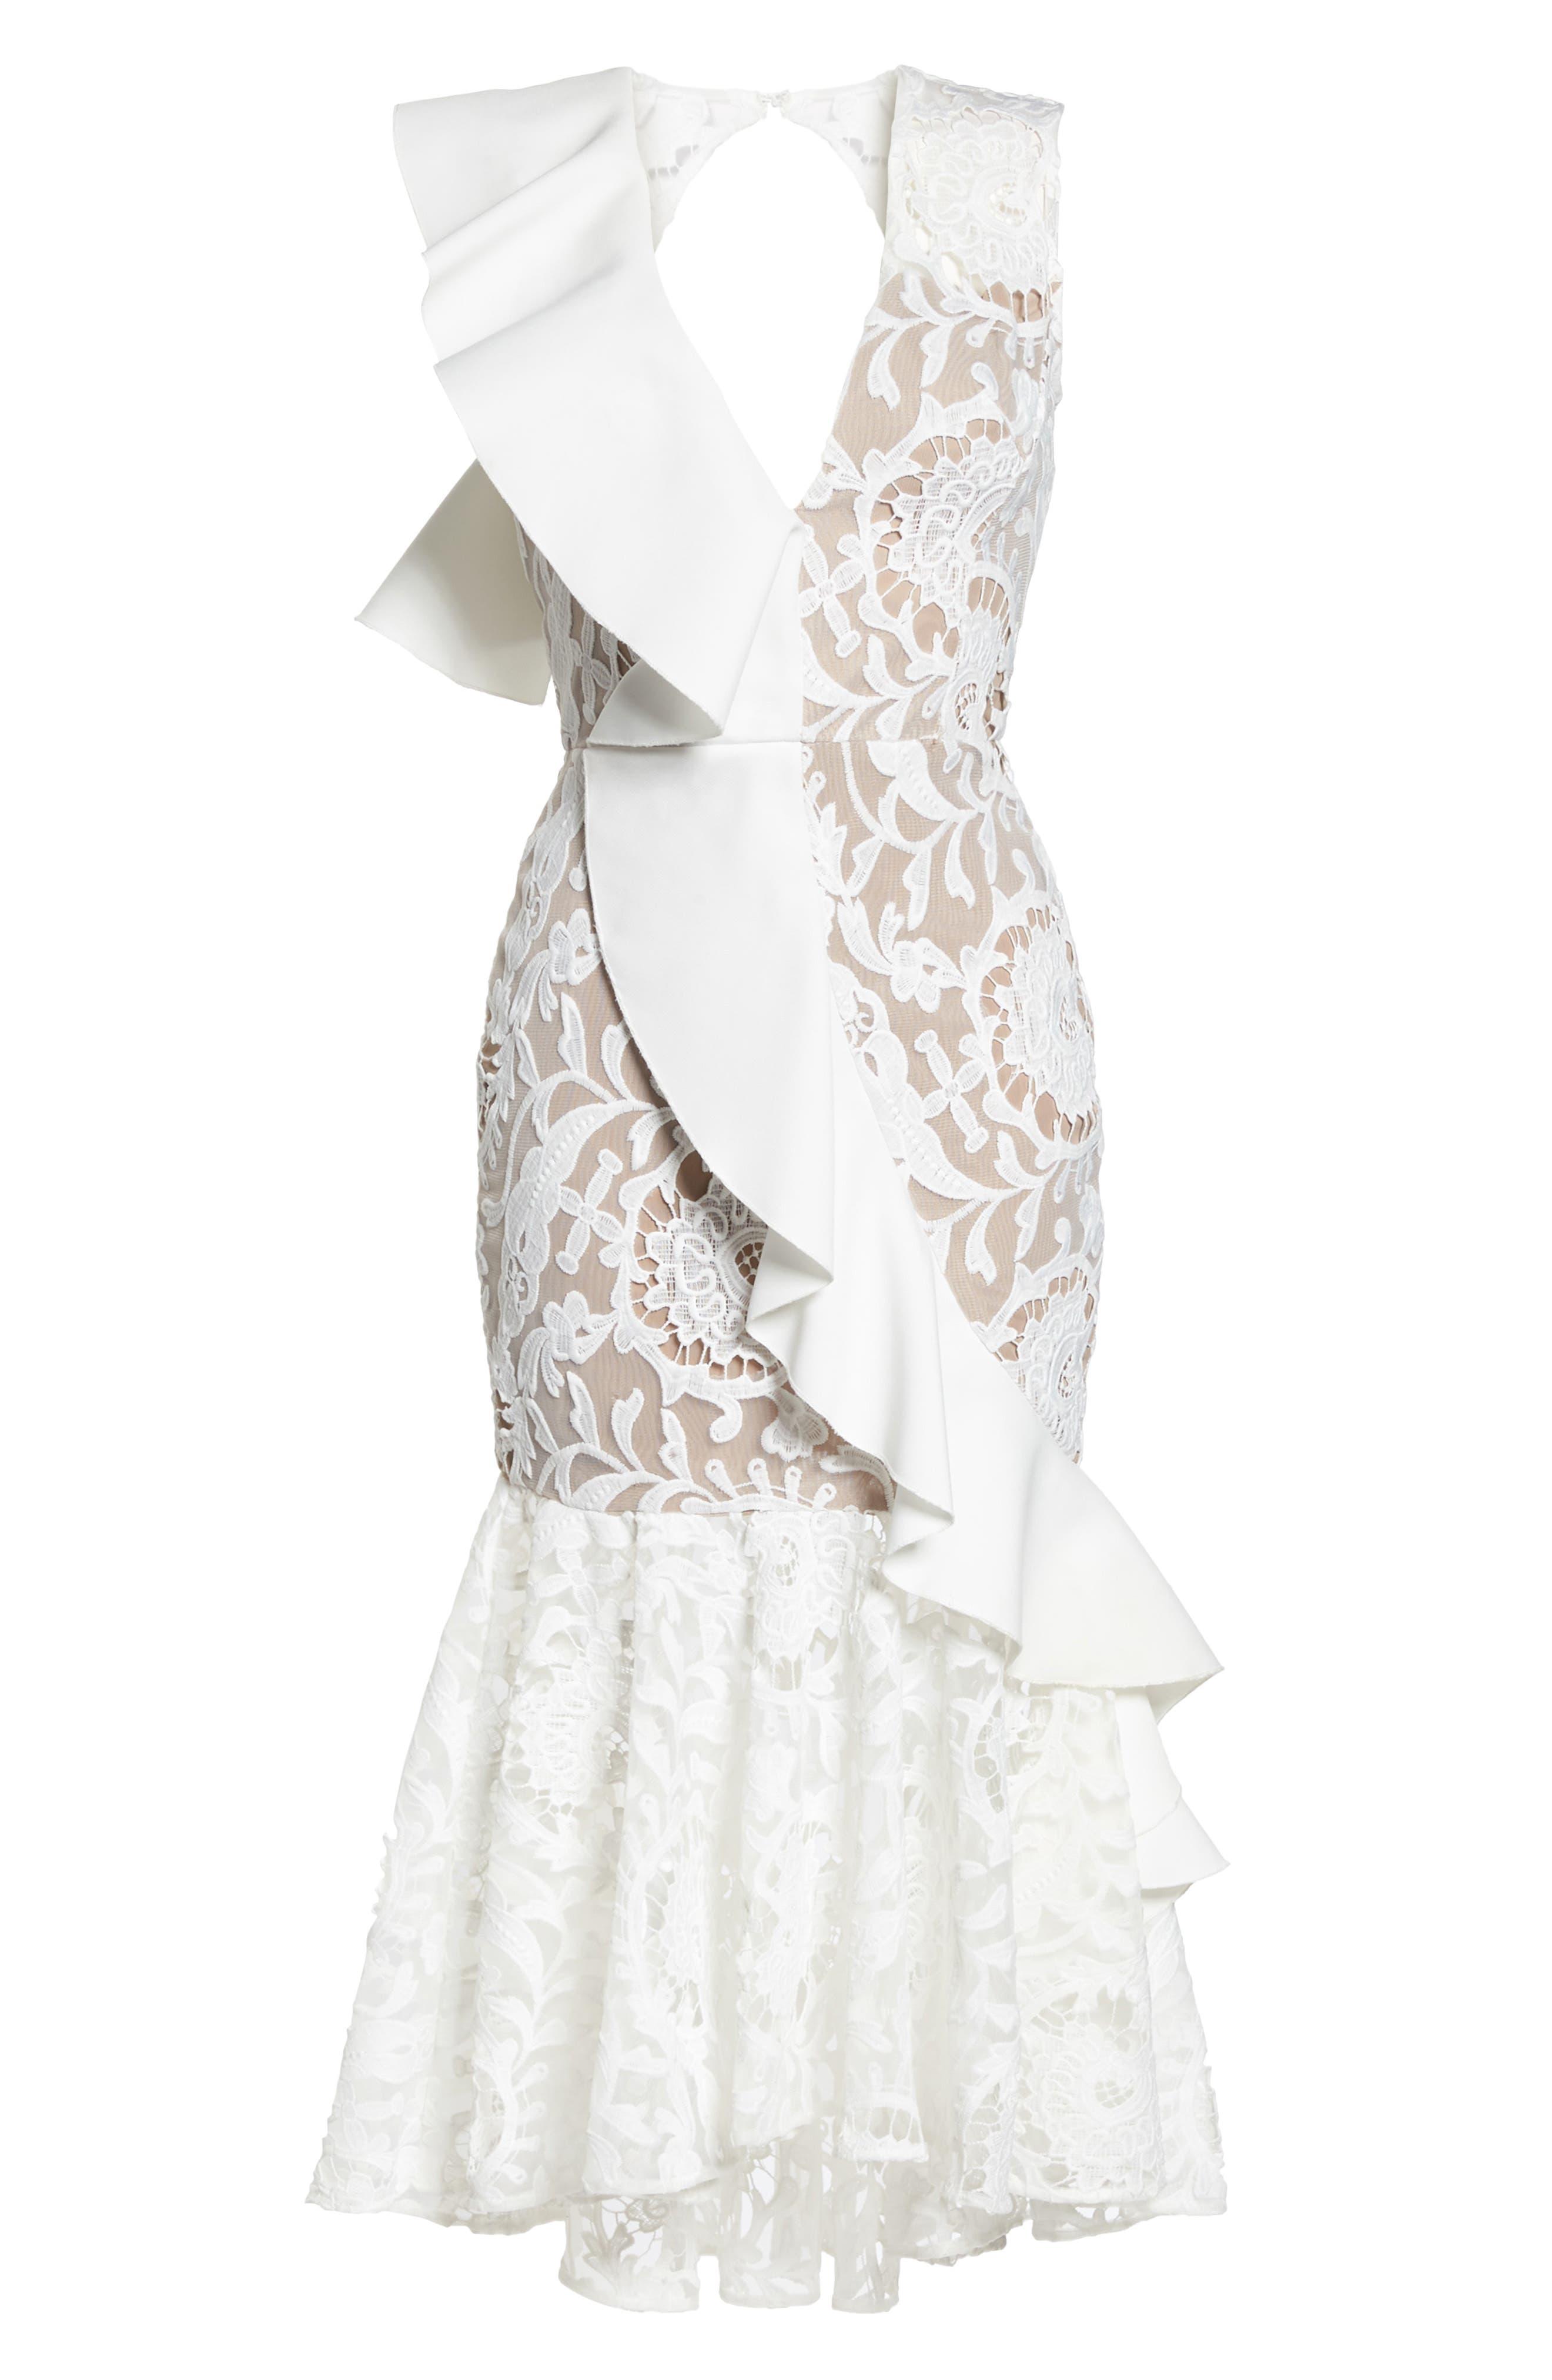 Rocha Waterfall Ruffle Lace Midi Dress,                             Alternate thumbnail 6, color,                             White